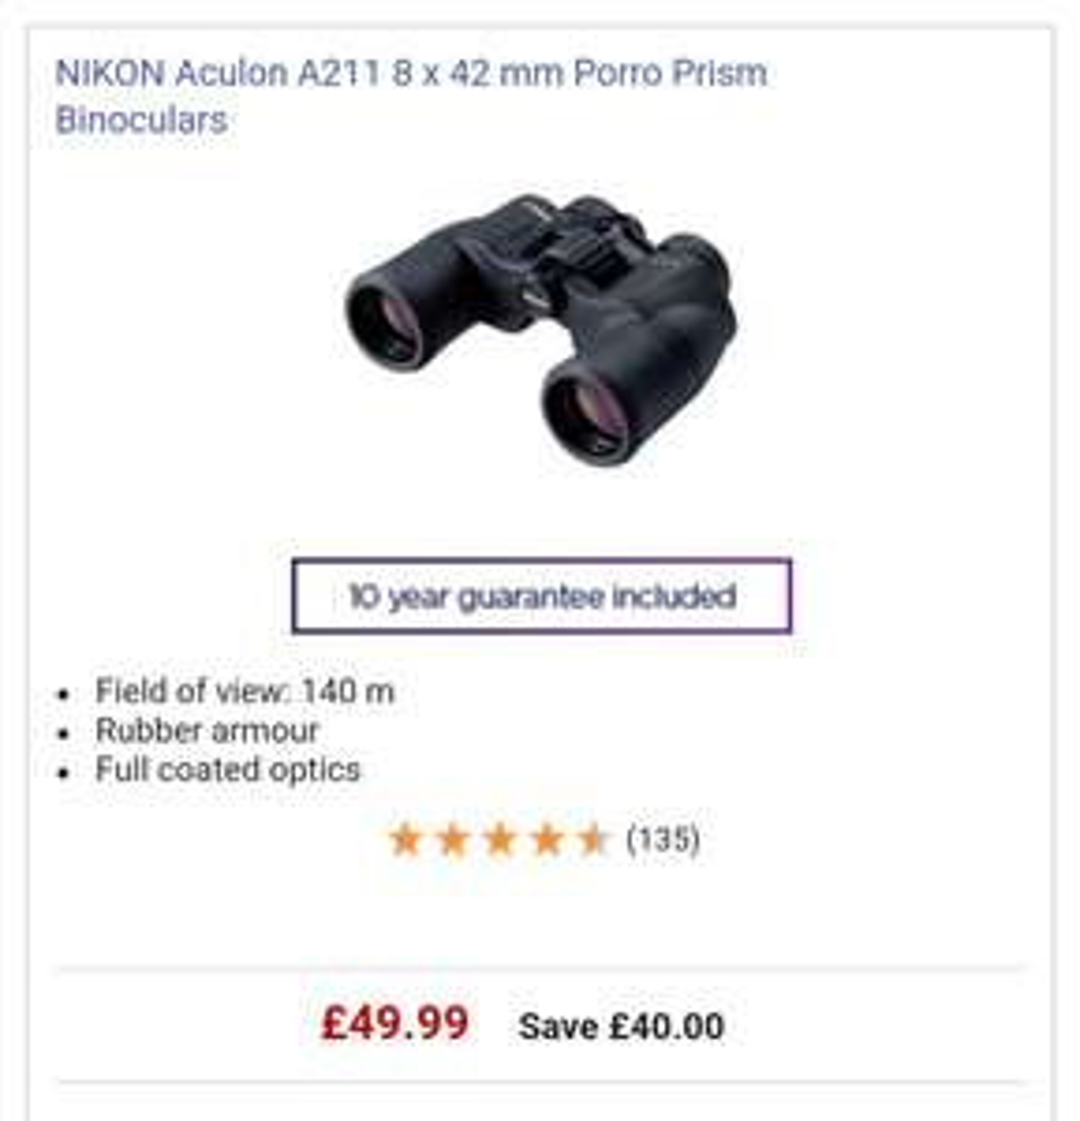 NIKONAculon A211 8 x 42 mm Binoculars £49.99 @ Currys